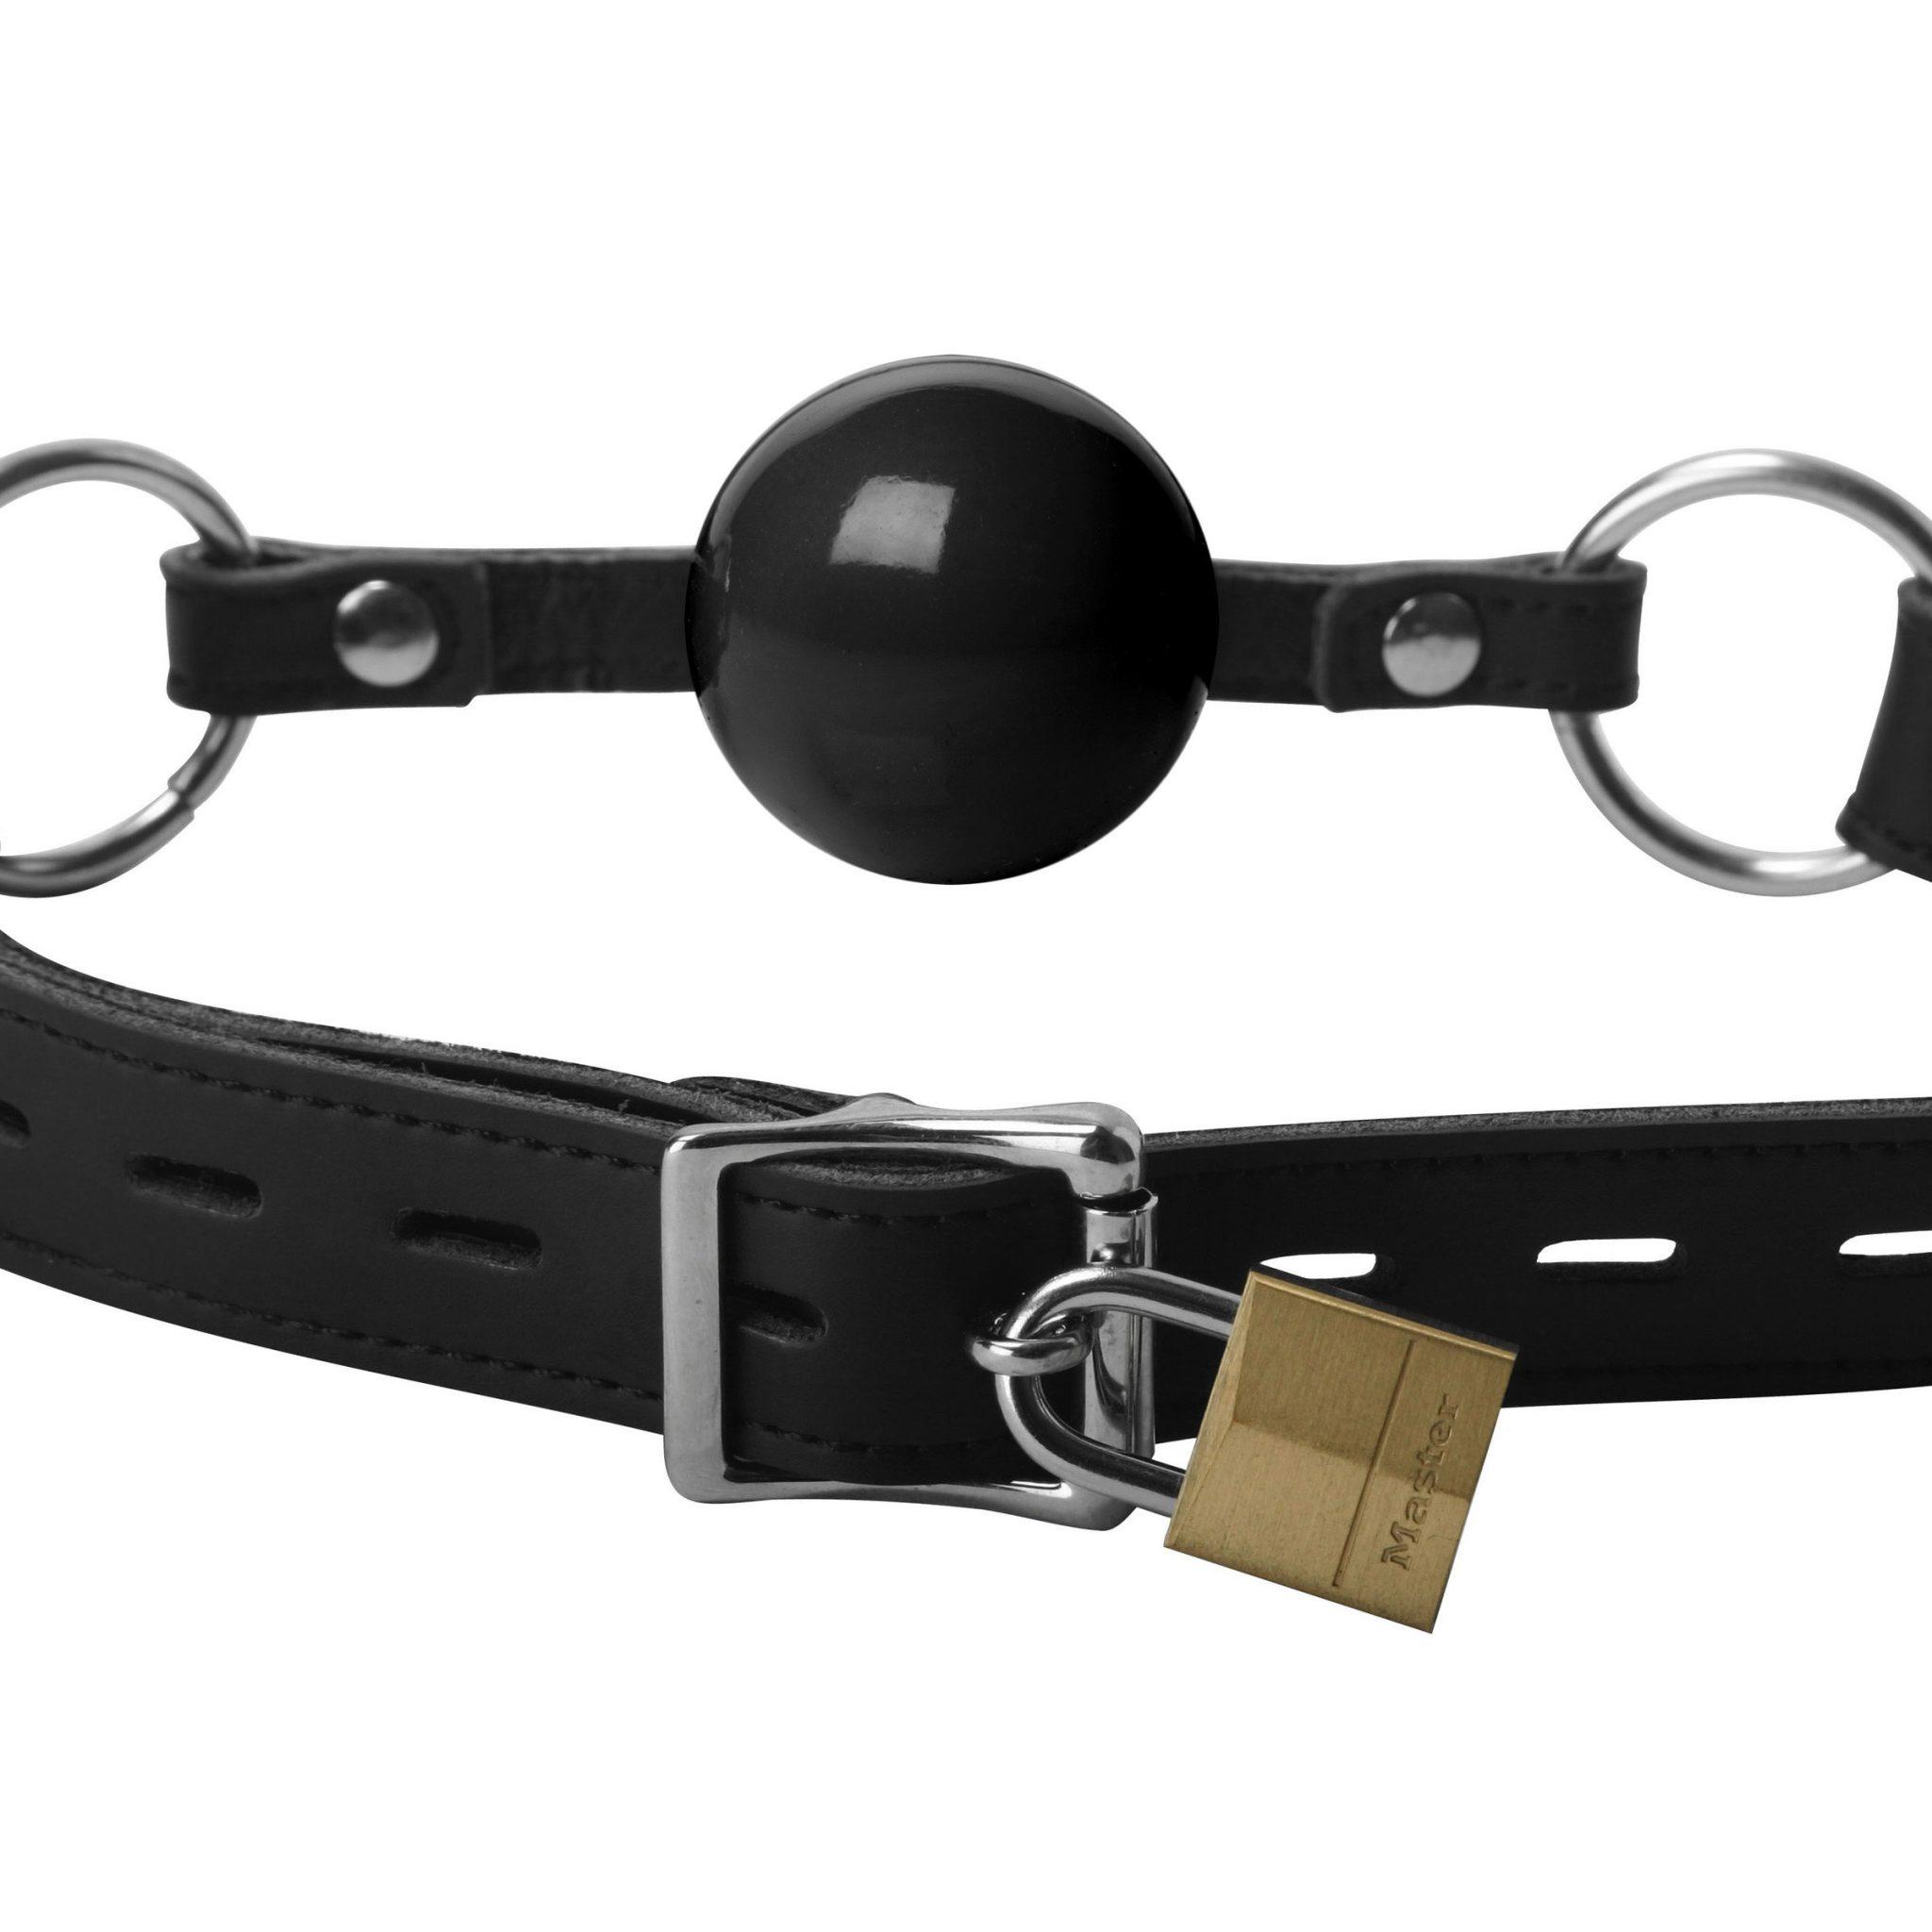 Classic Locking Silicone Ball Gag – Black